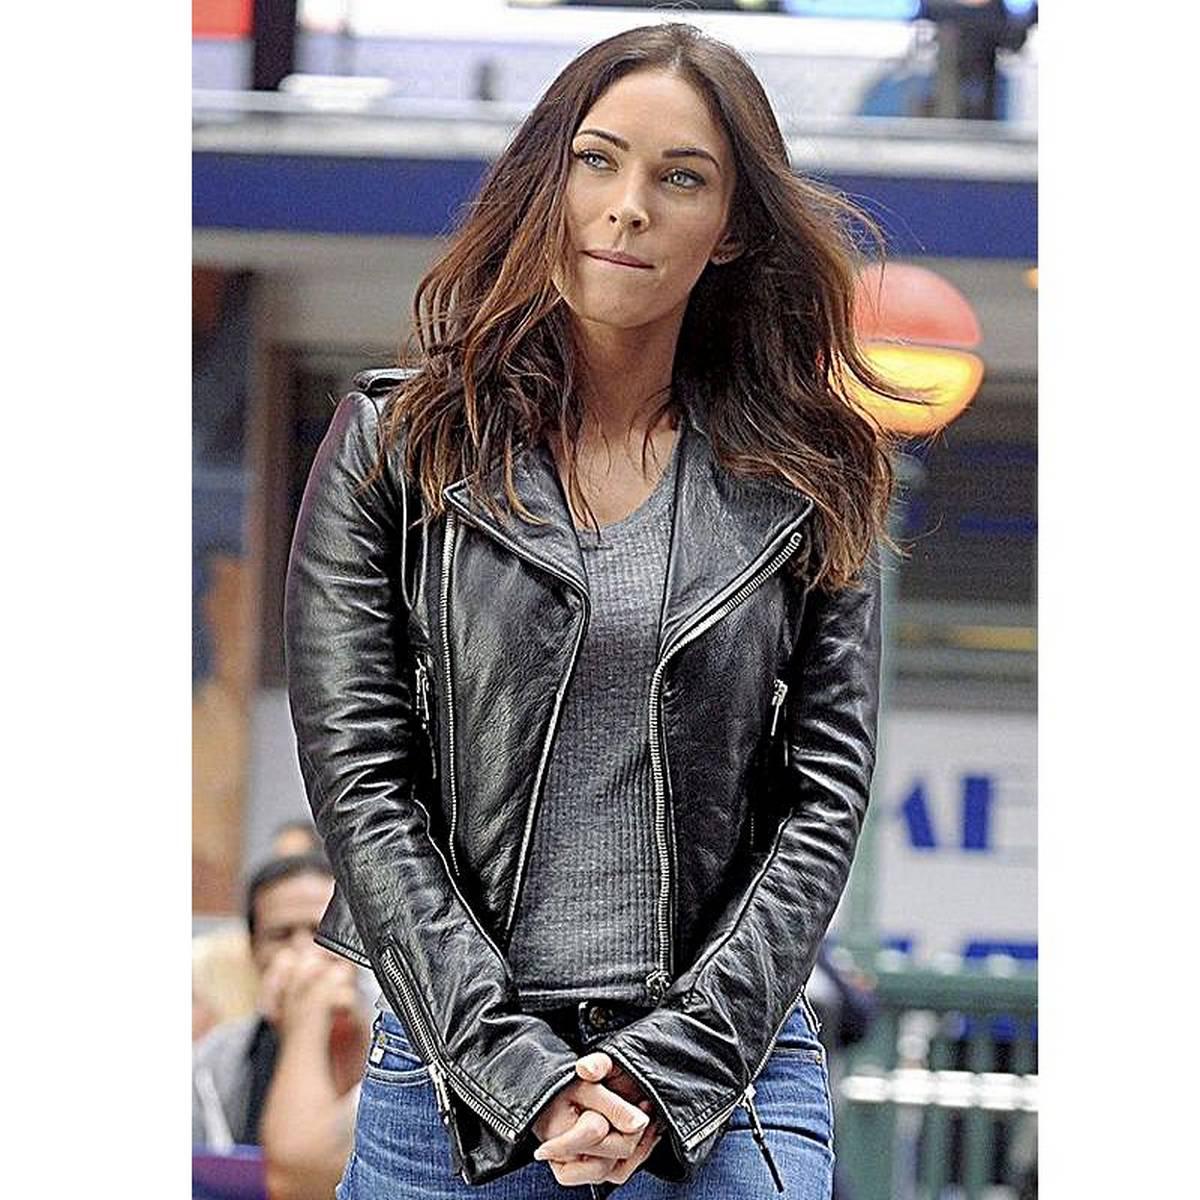 Megan Fox Faux Ladies Leather Jacket For Women - Black